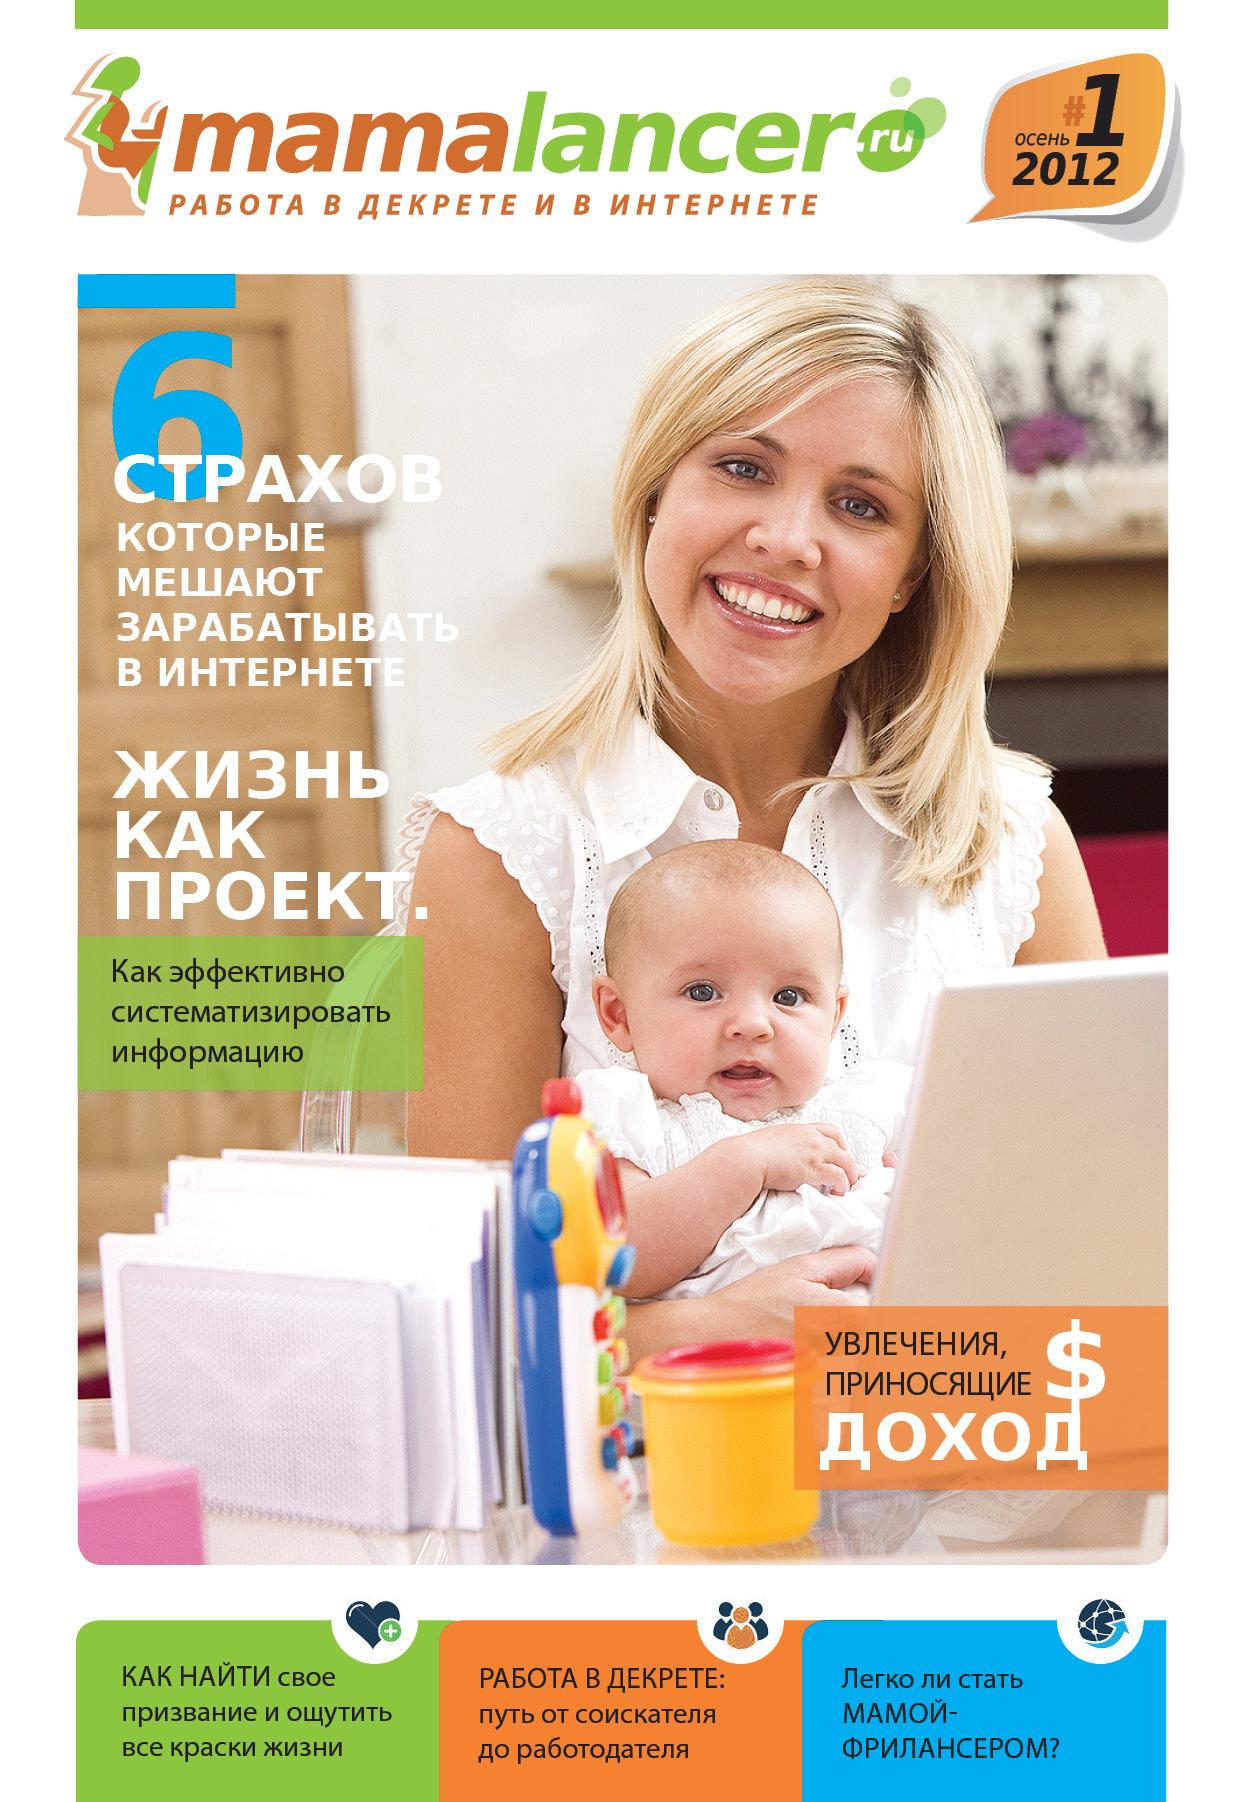 Журнал MAMALANCER - 1-й номер